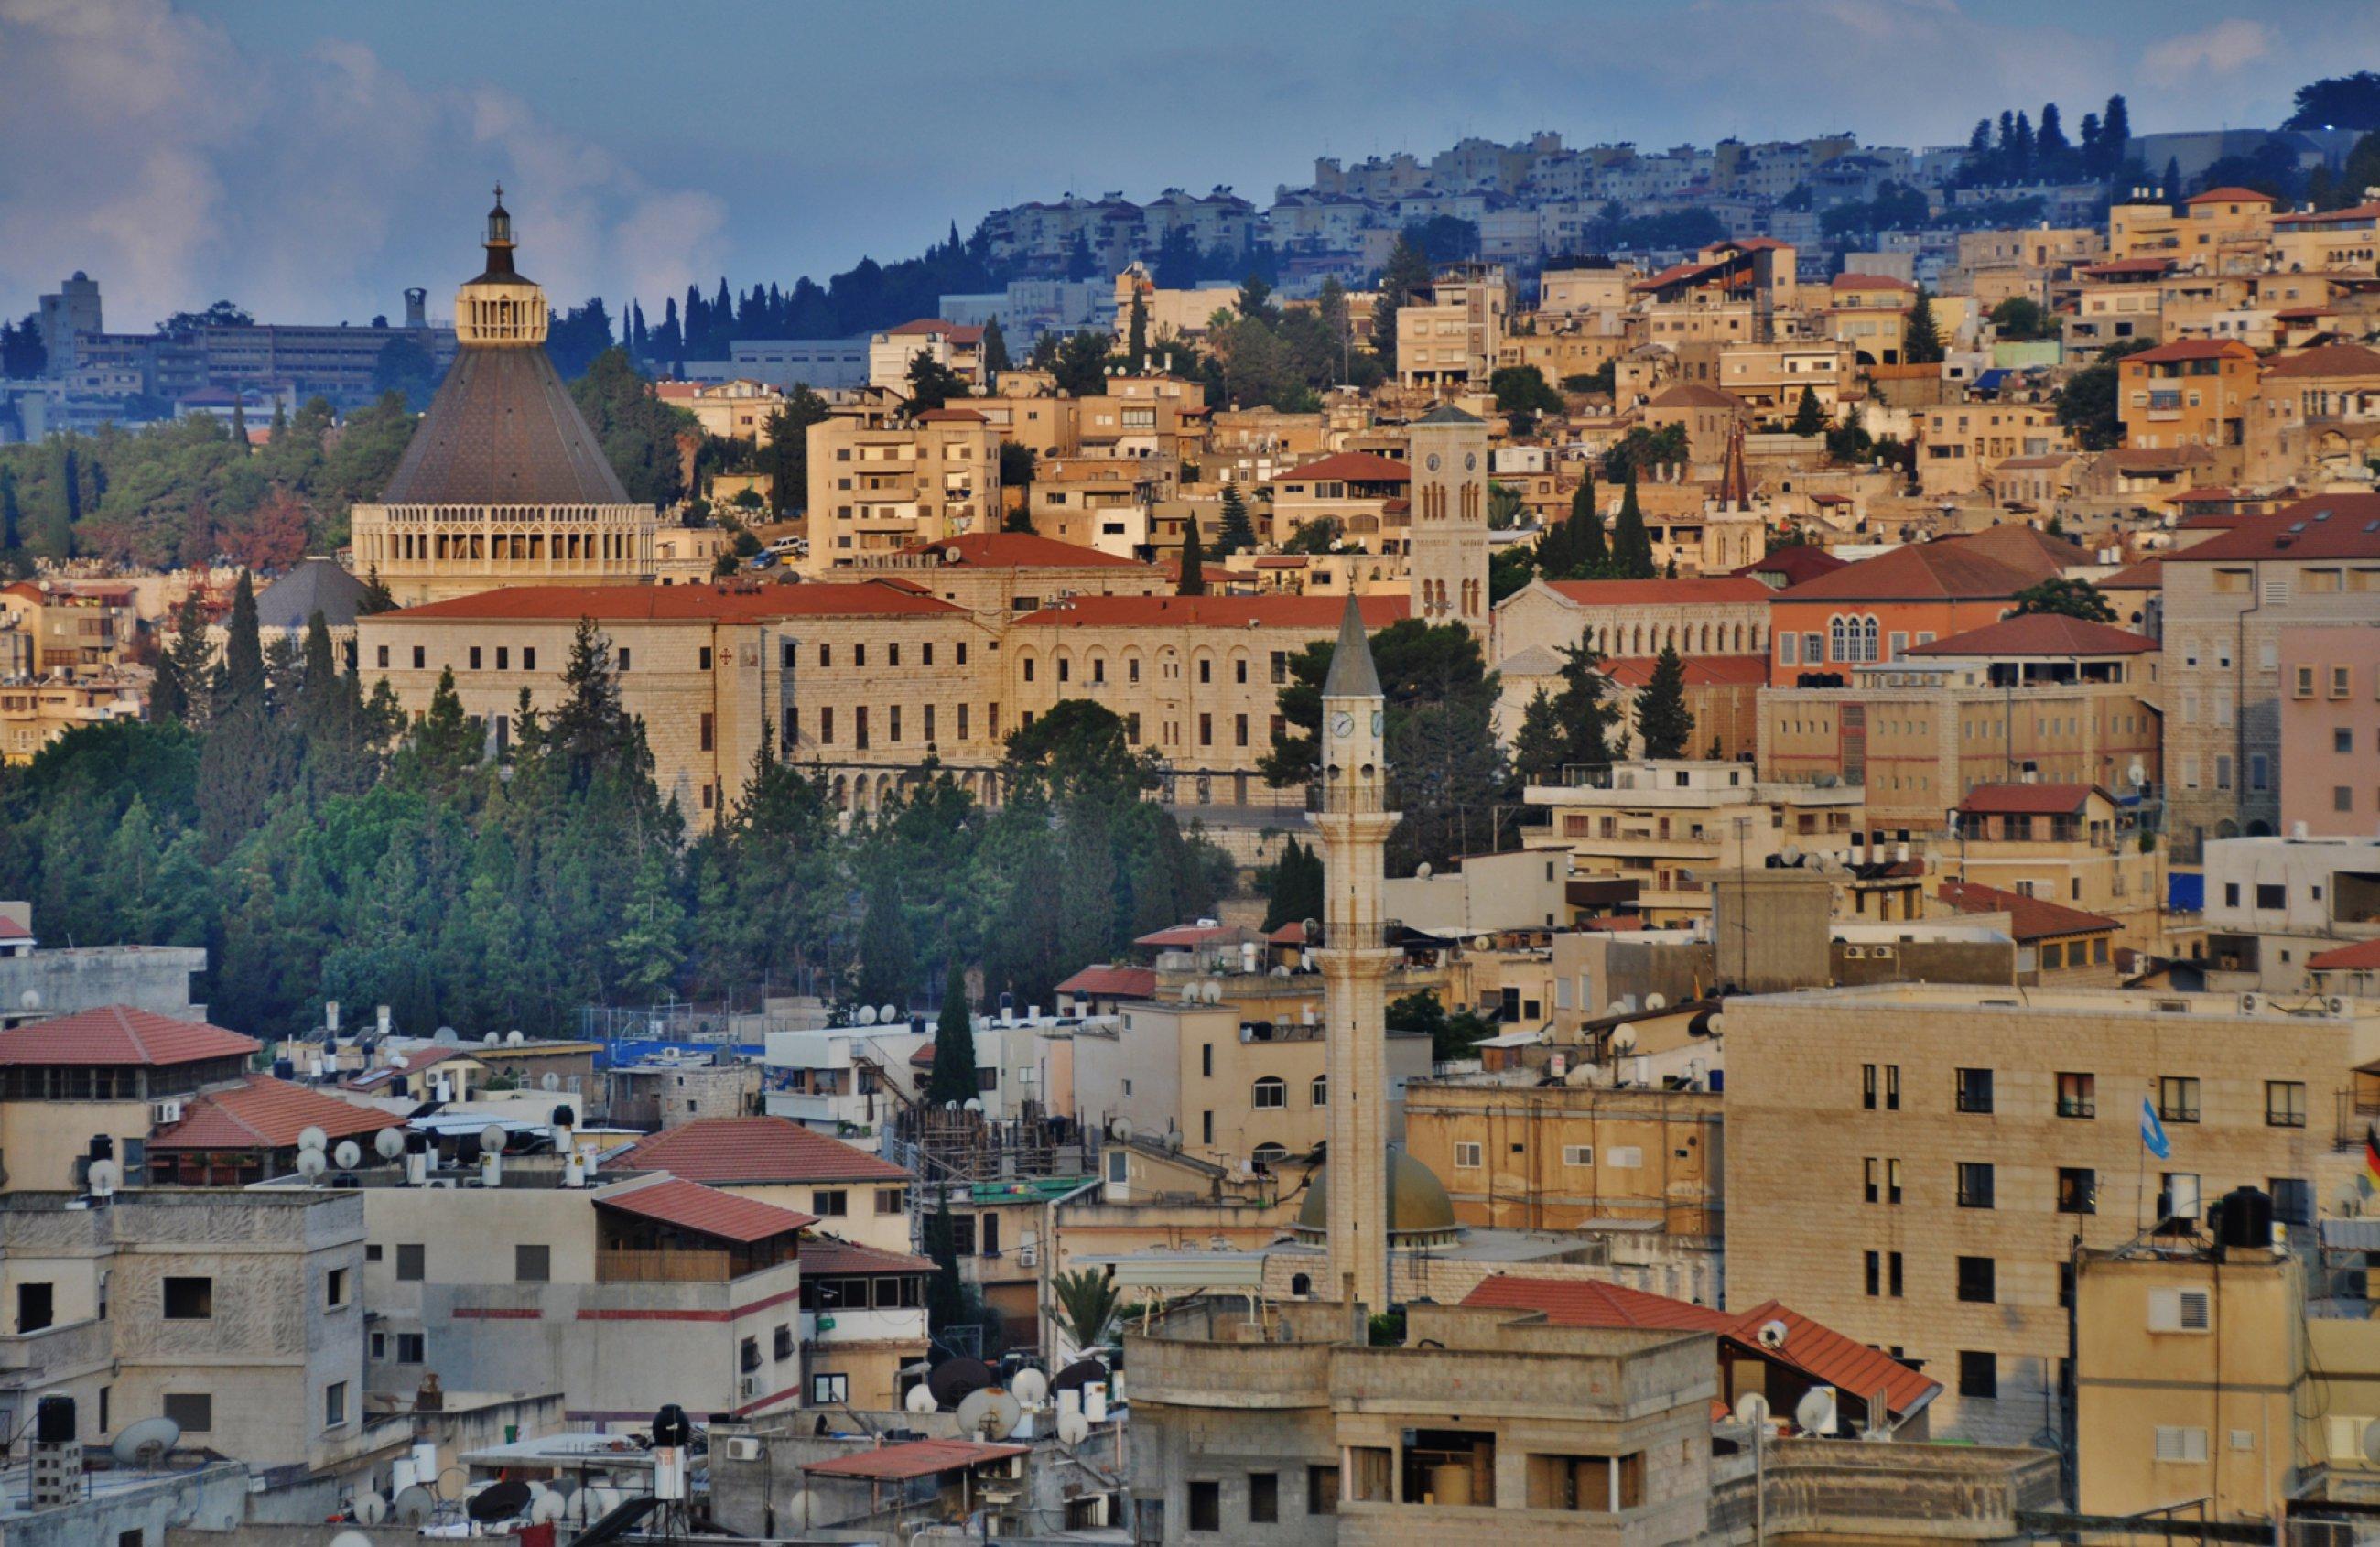 https://bubo.sk/uploads/galleries/4934/palestina-nazareth-tomas-kubus-2014-2-.jpg